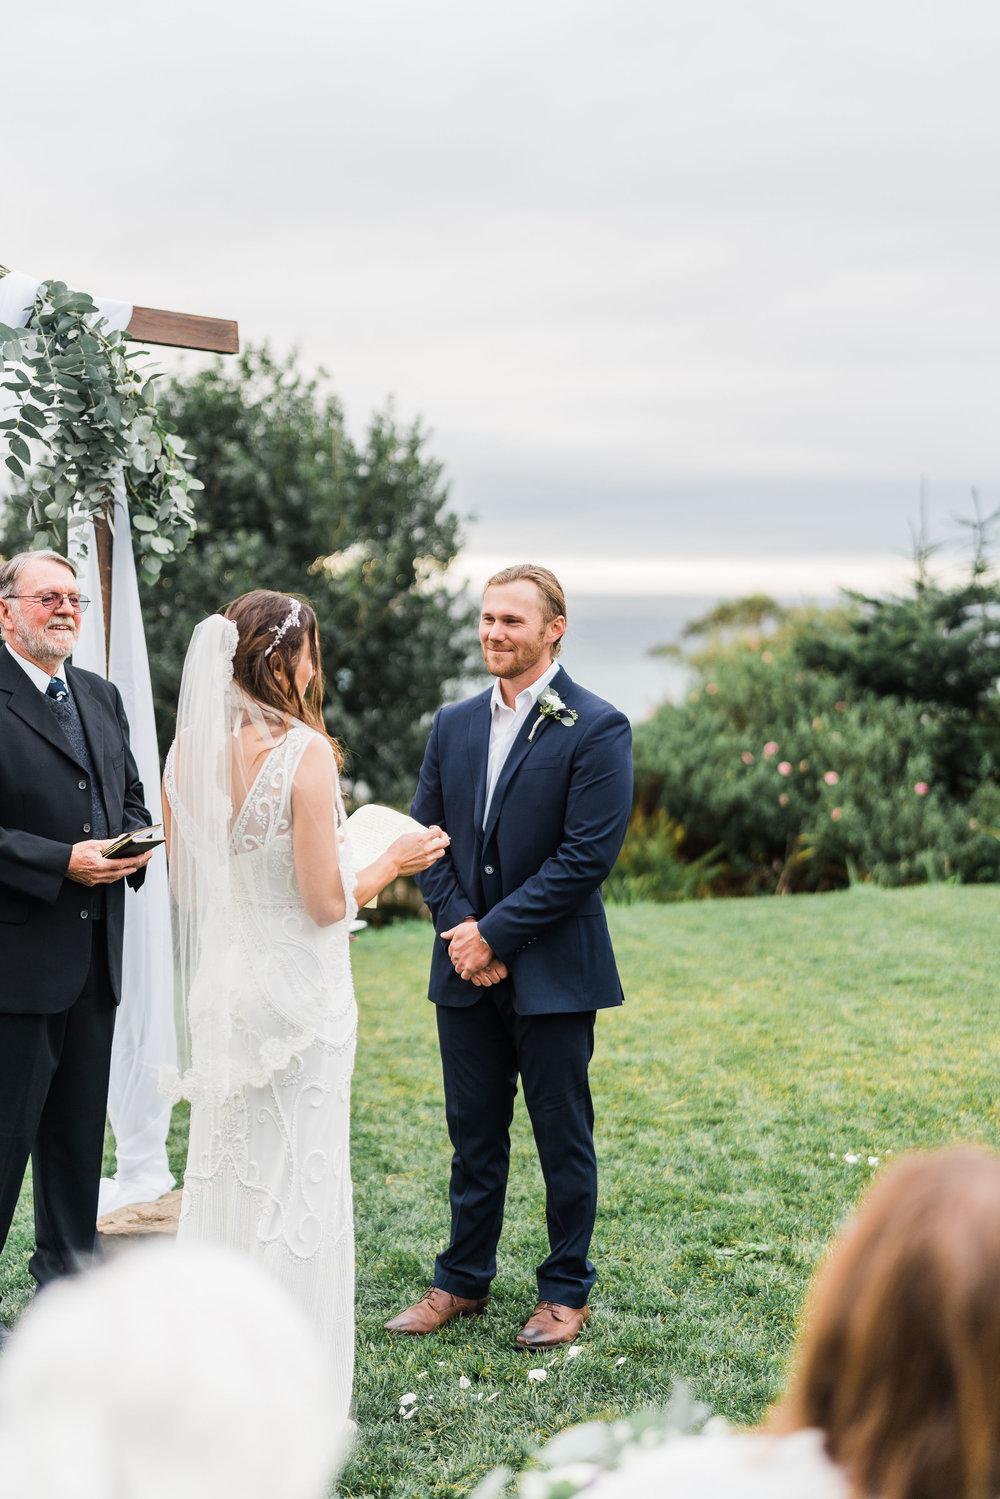 switzer-farm-wedding-westport-brandon-bibbins-photograhy-fine-art-061.jpg